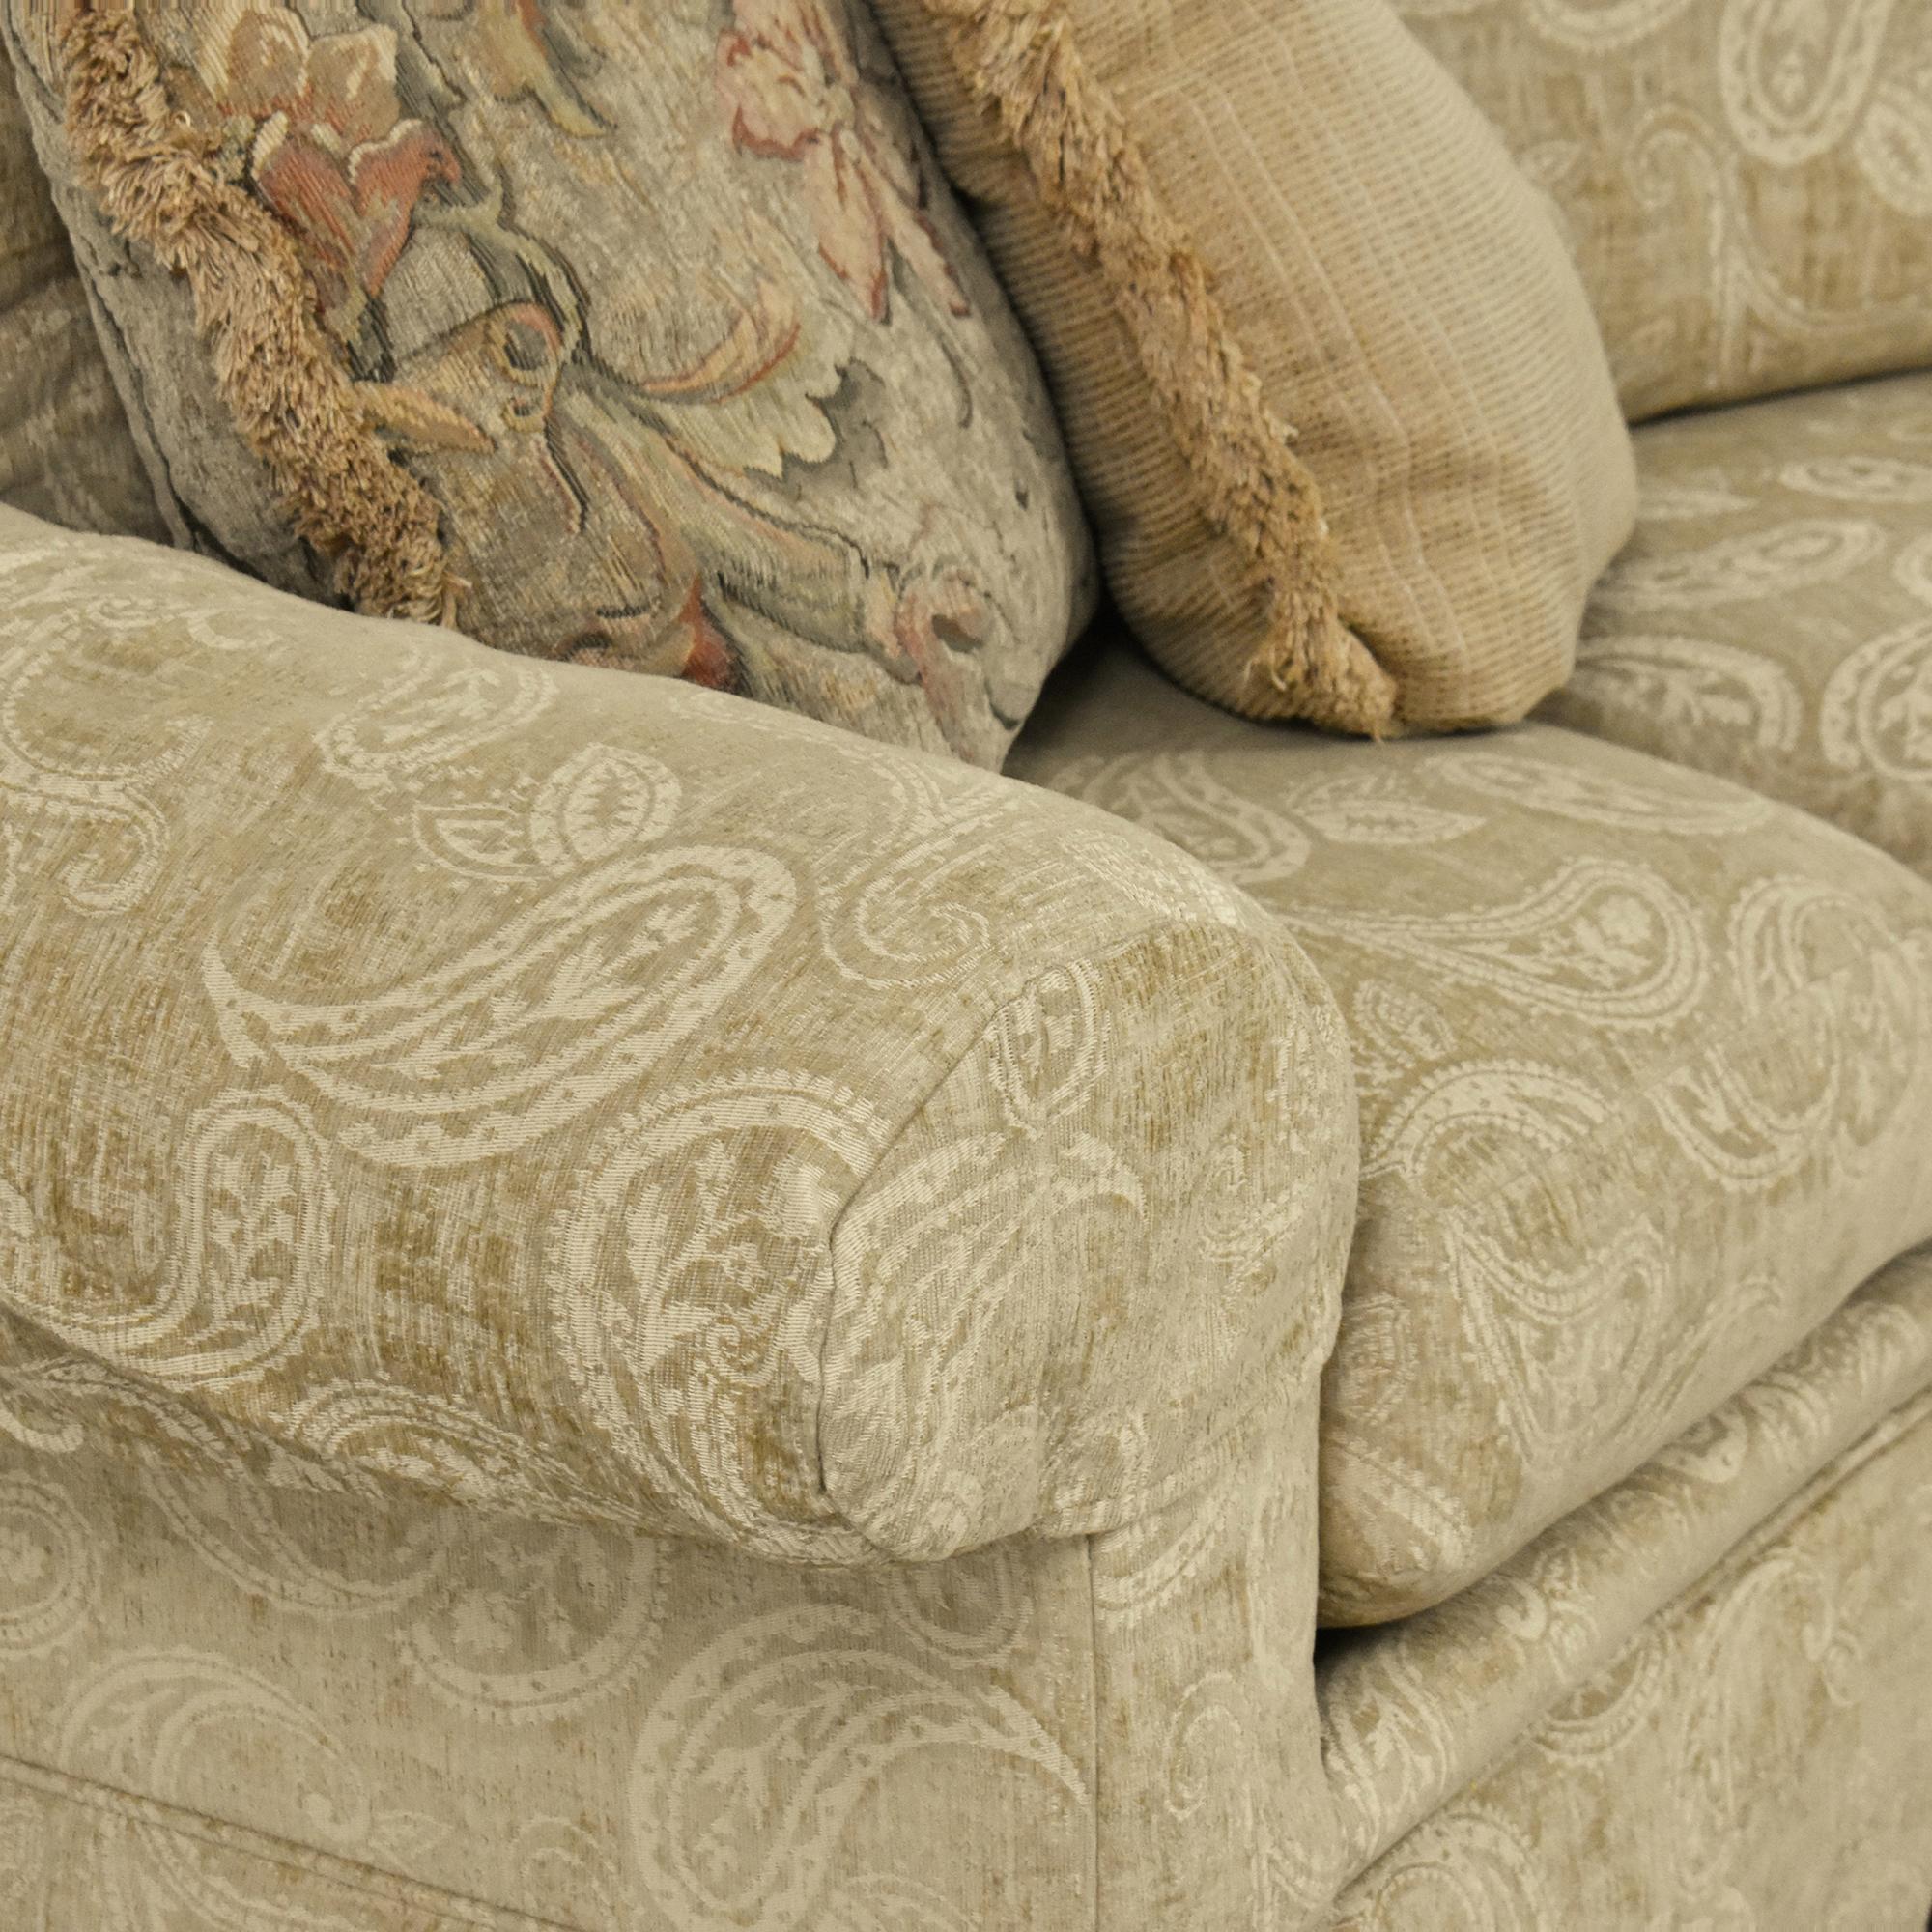 Thomasville Wedge Sofa / Sofas